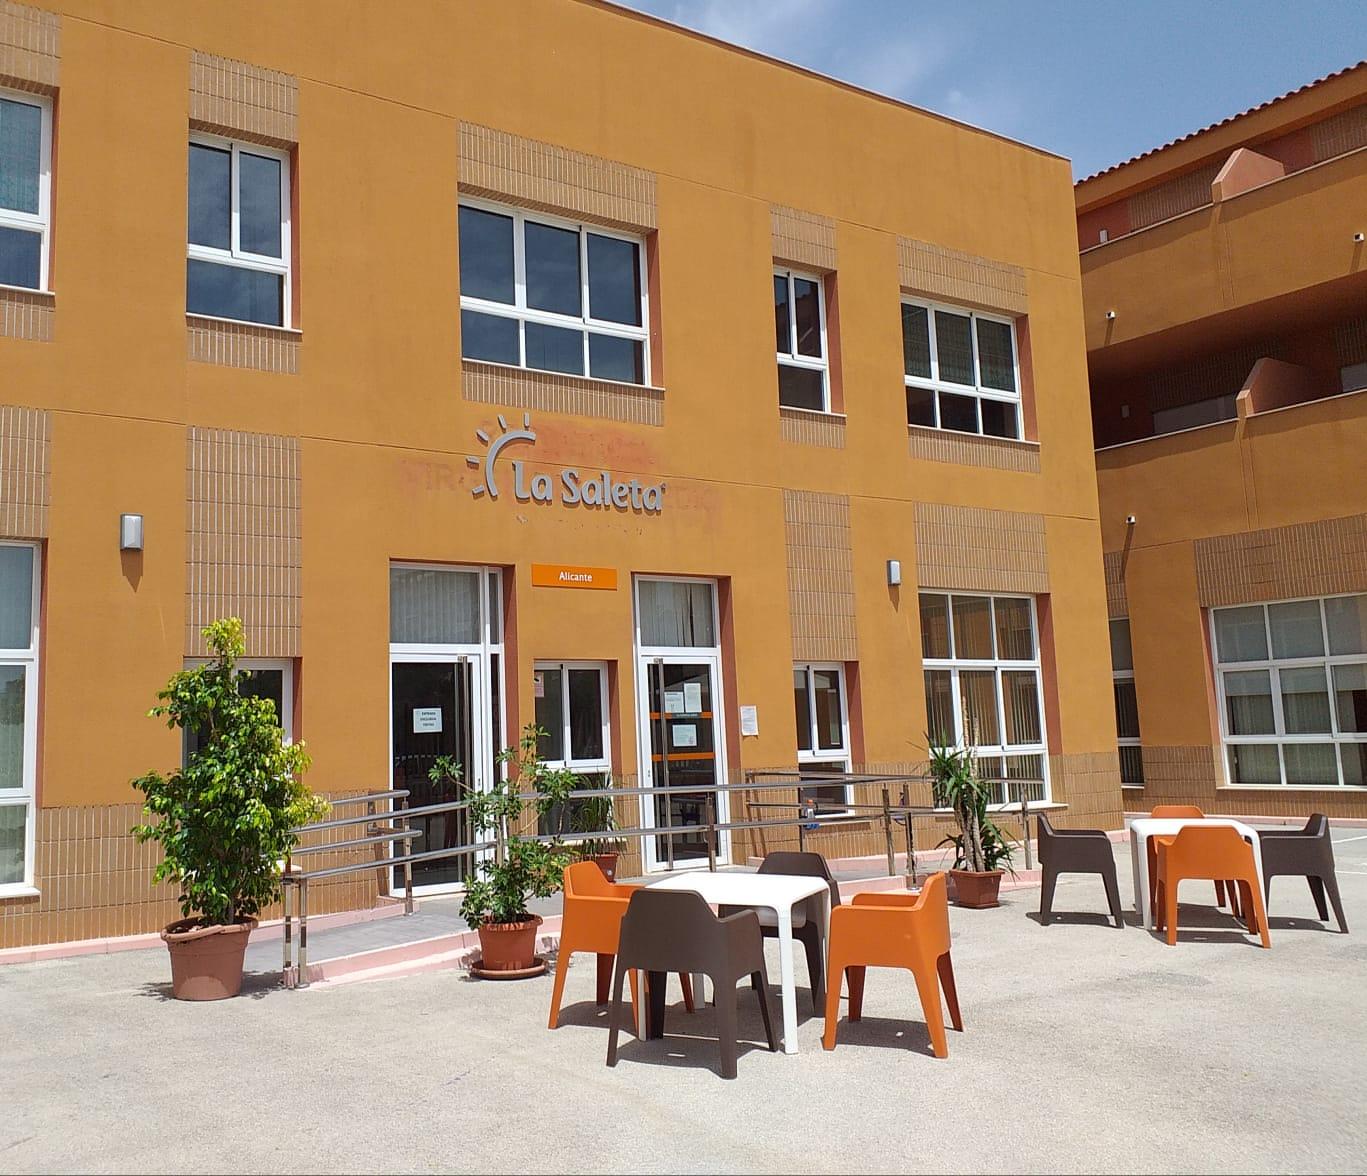 Residencia_La_Saleta_Alicante_Fachada